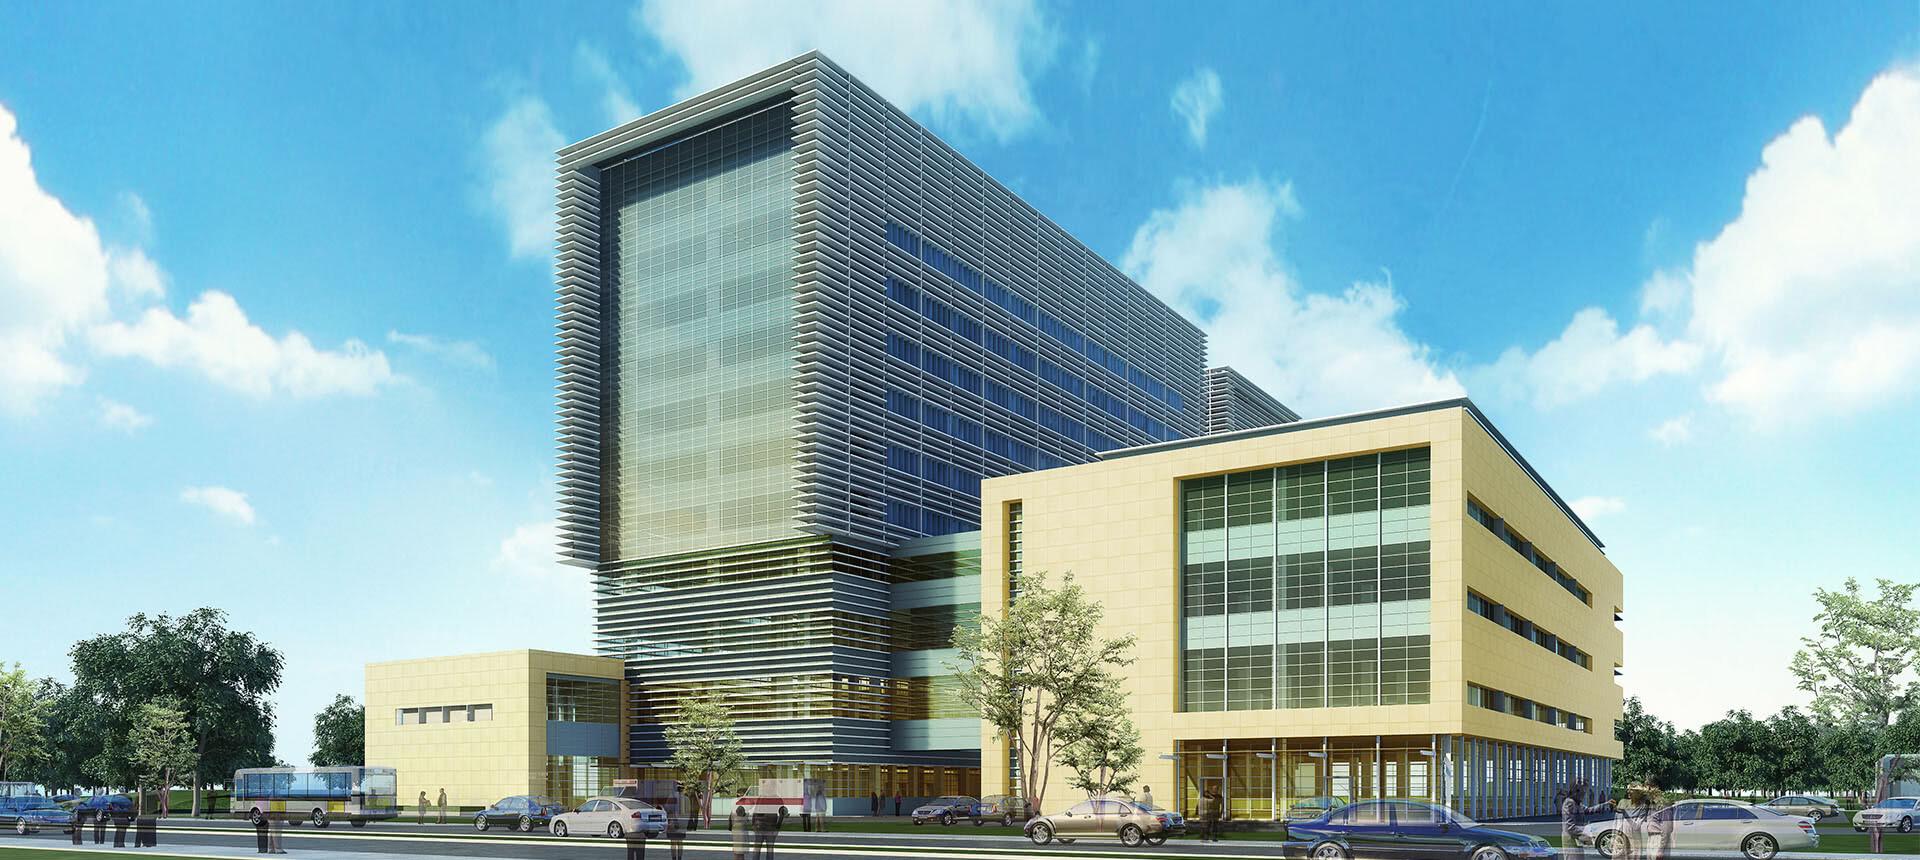 tianjin-medical-university-eco-city-metabolic-disease-hospital-1